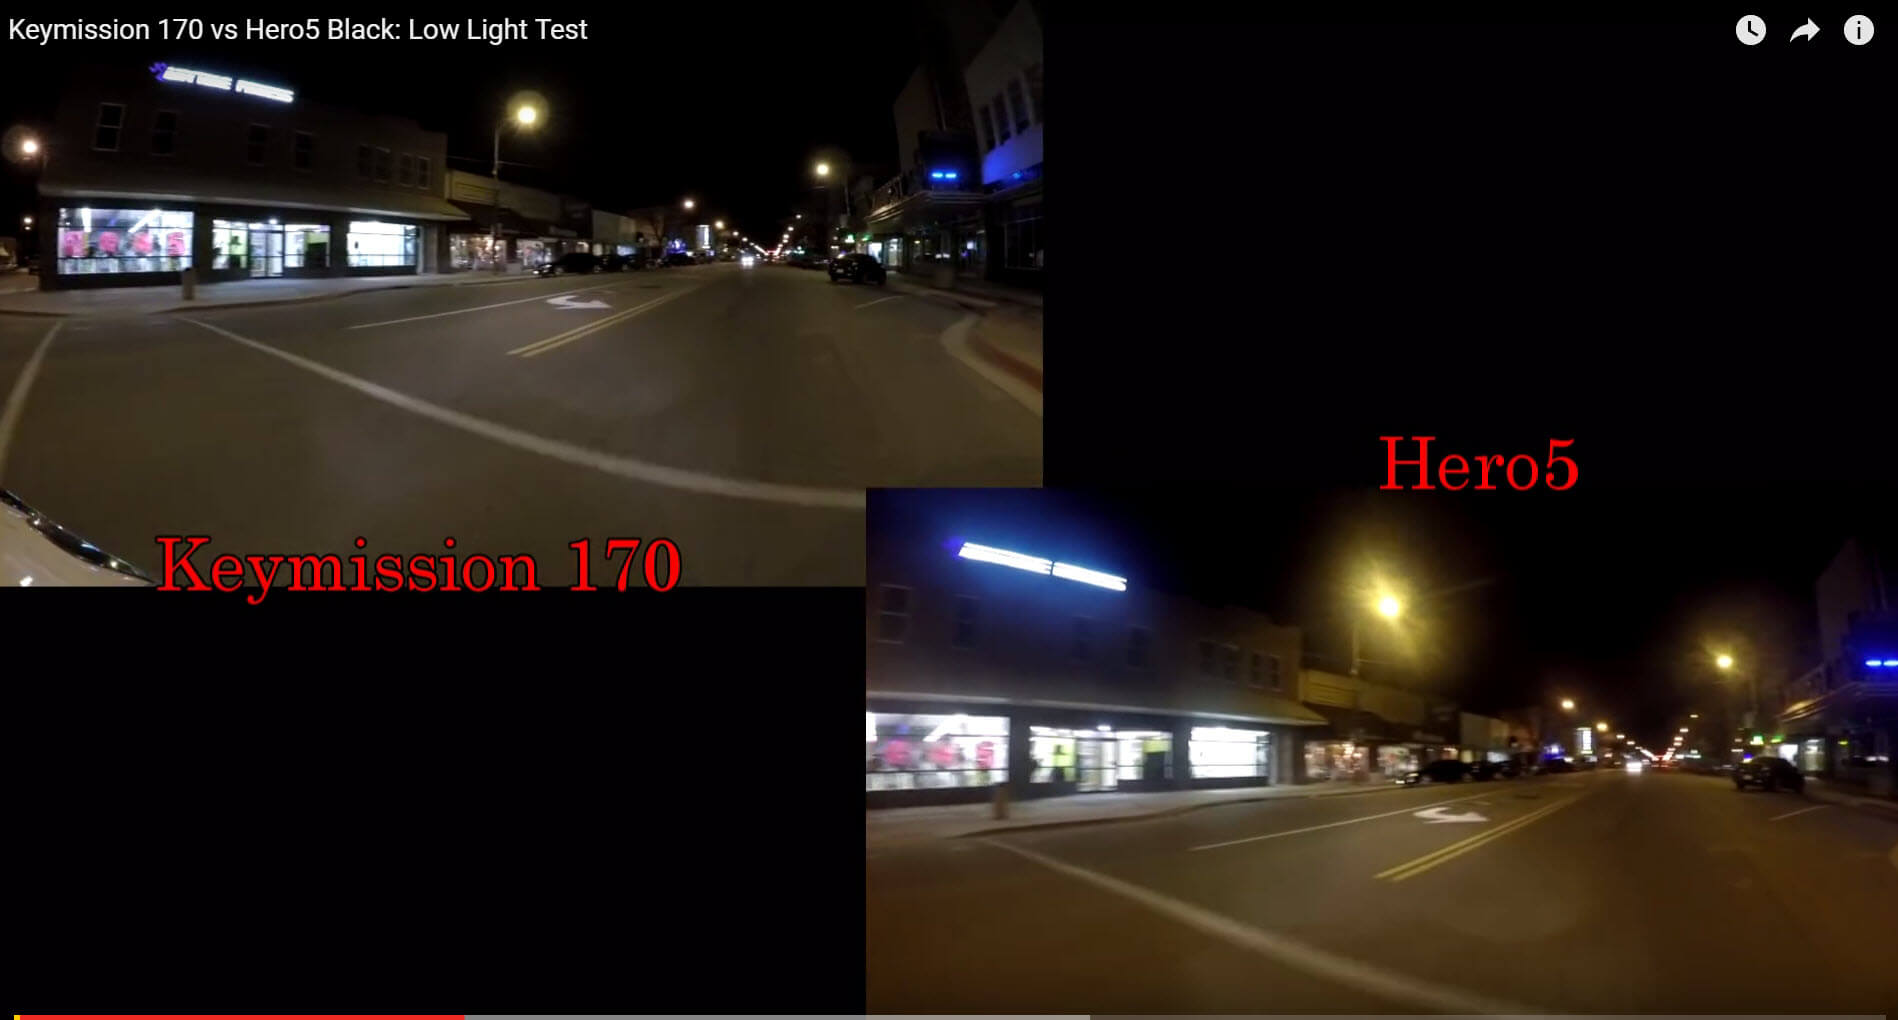 hero5 balck keymission170 low light test